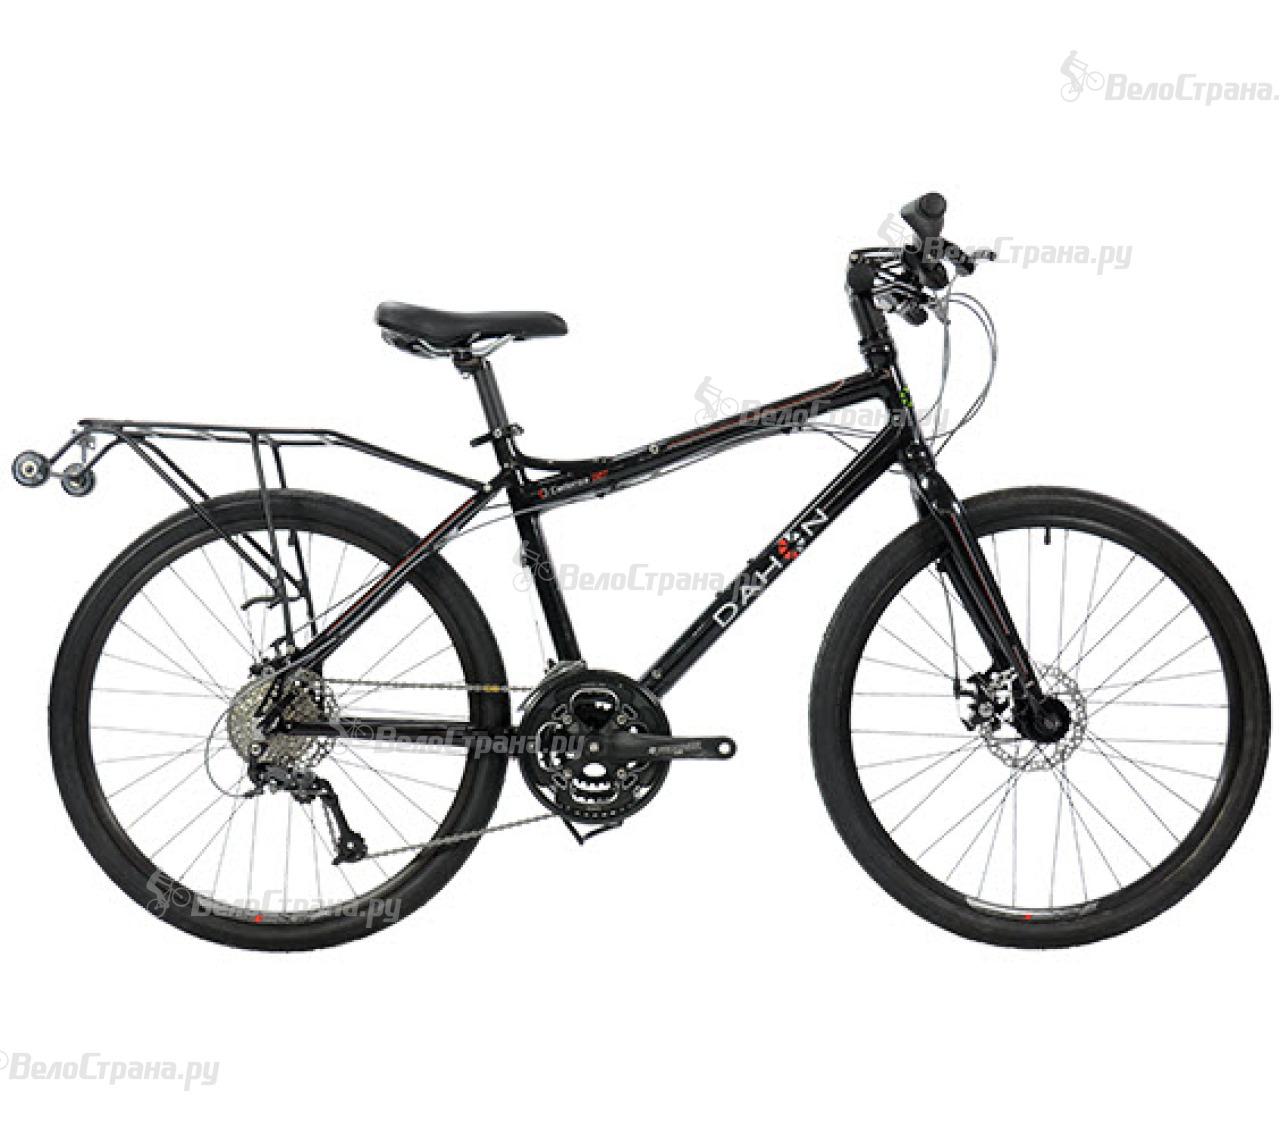 Велосипед Dahon Cadenza D27 (2016) велосипед dahon speed d7 2015